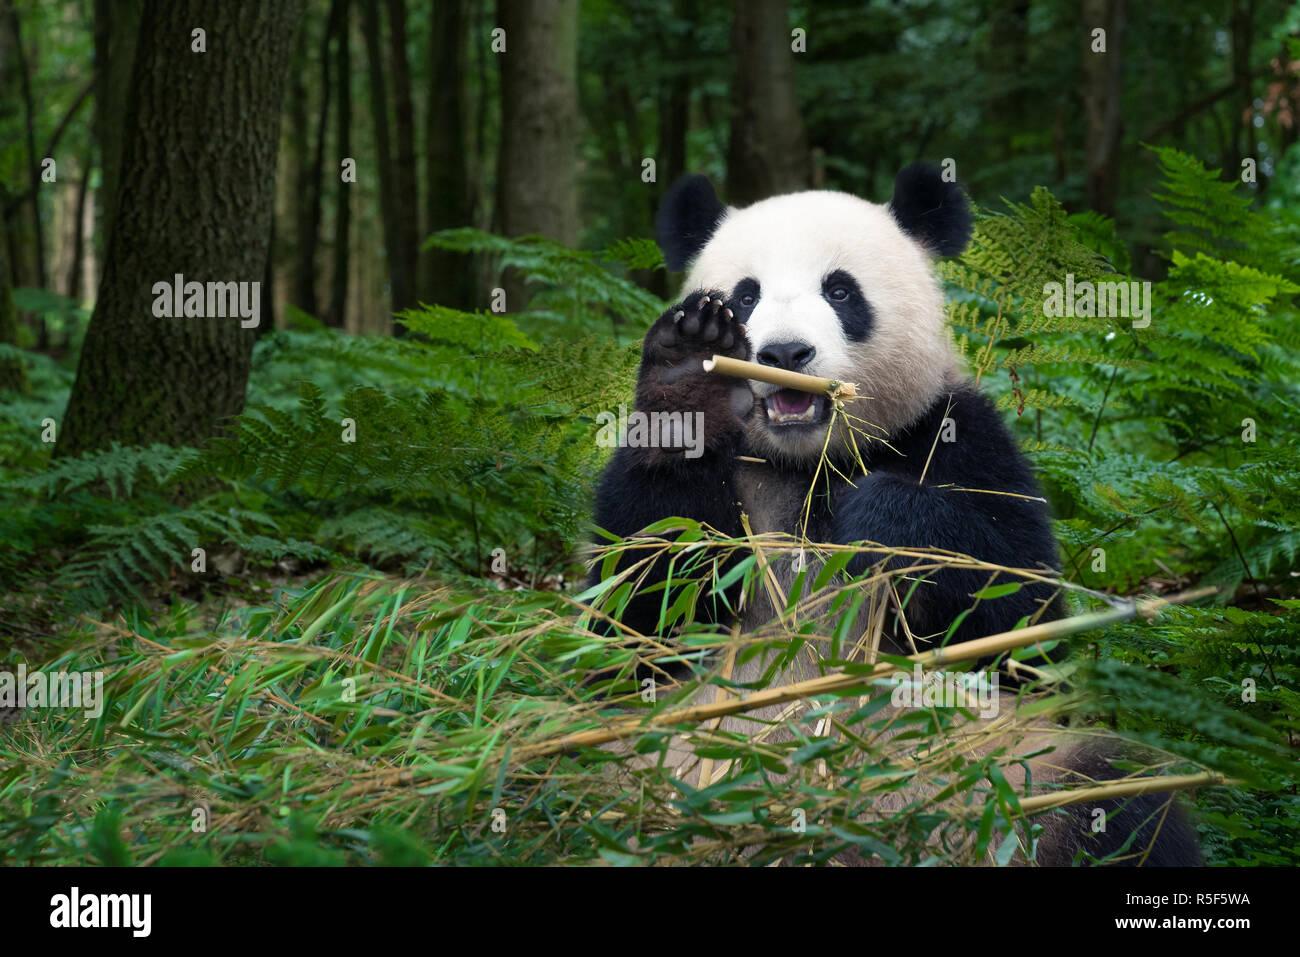 Panda Bar Sitzt Im Wald Bambus Essen Stockfoto Bild 227141974 Alamy